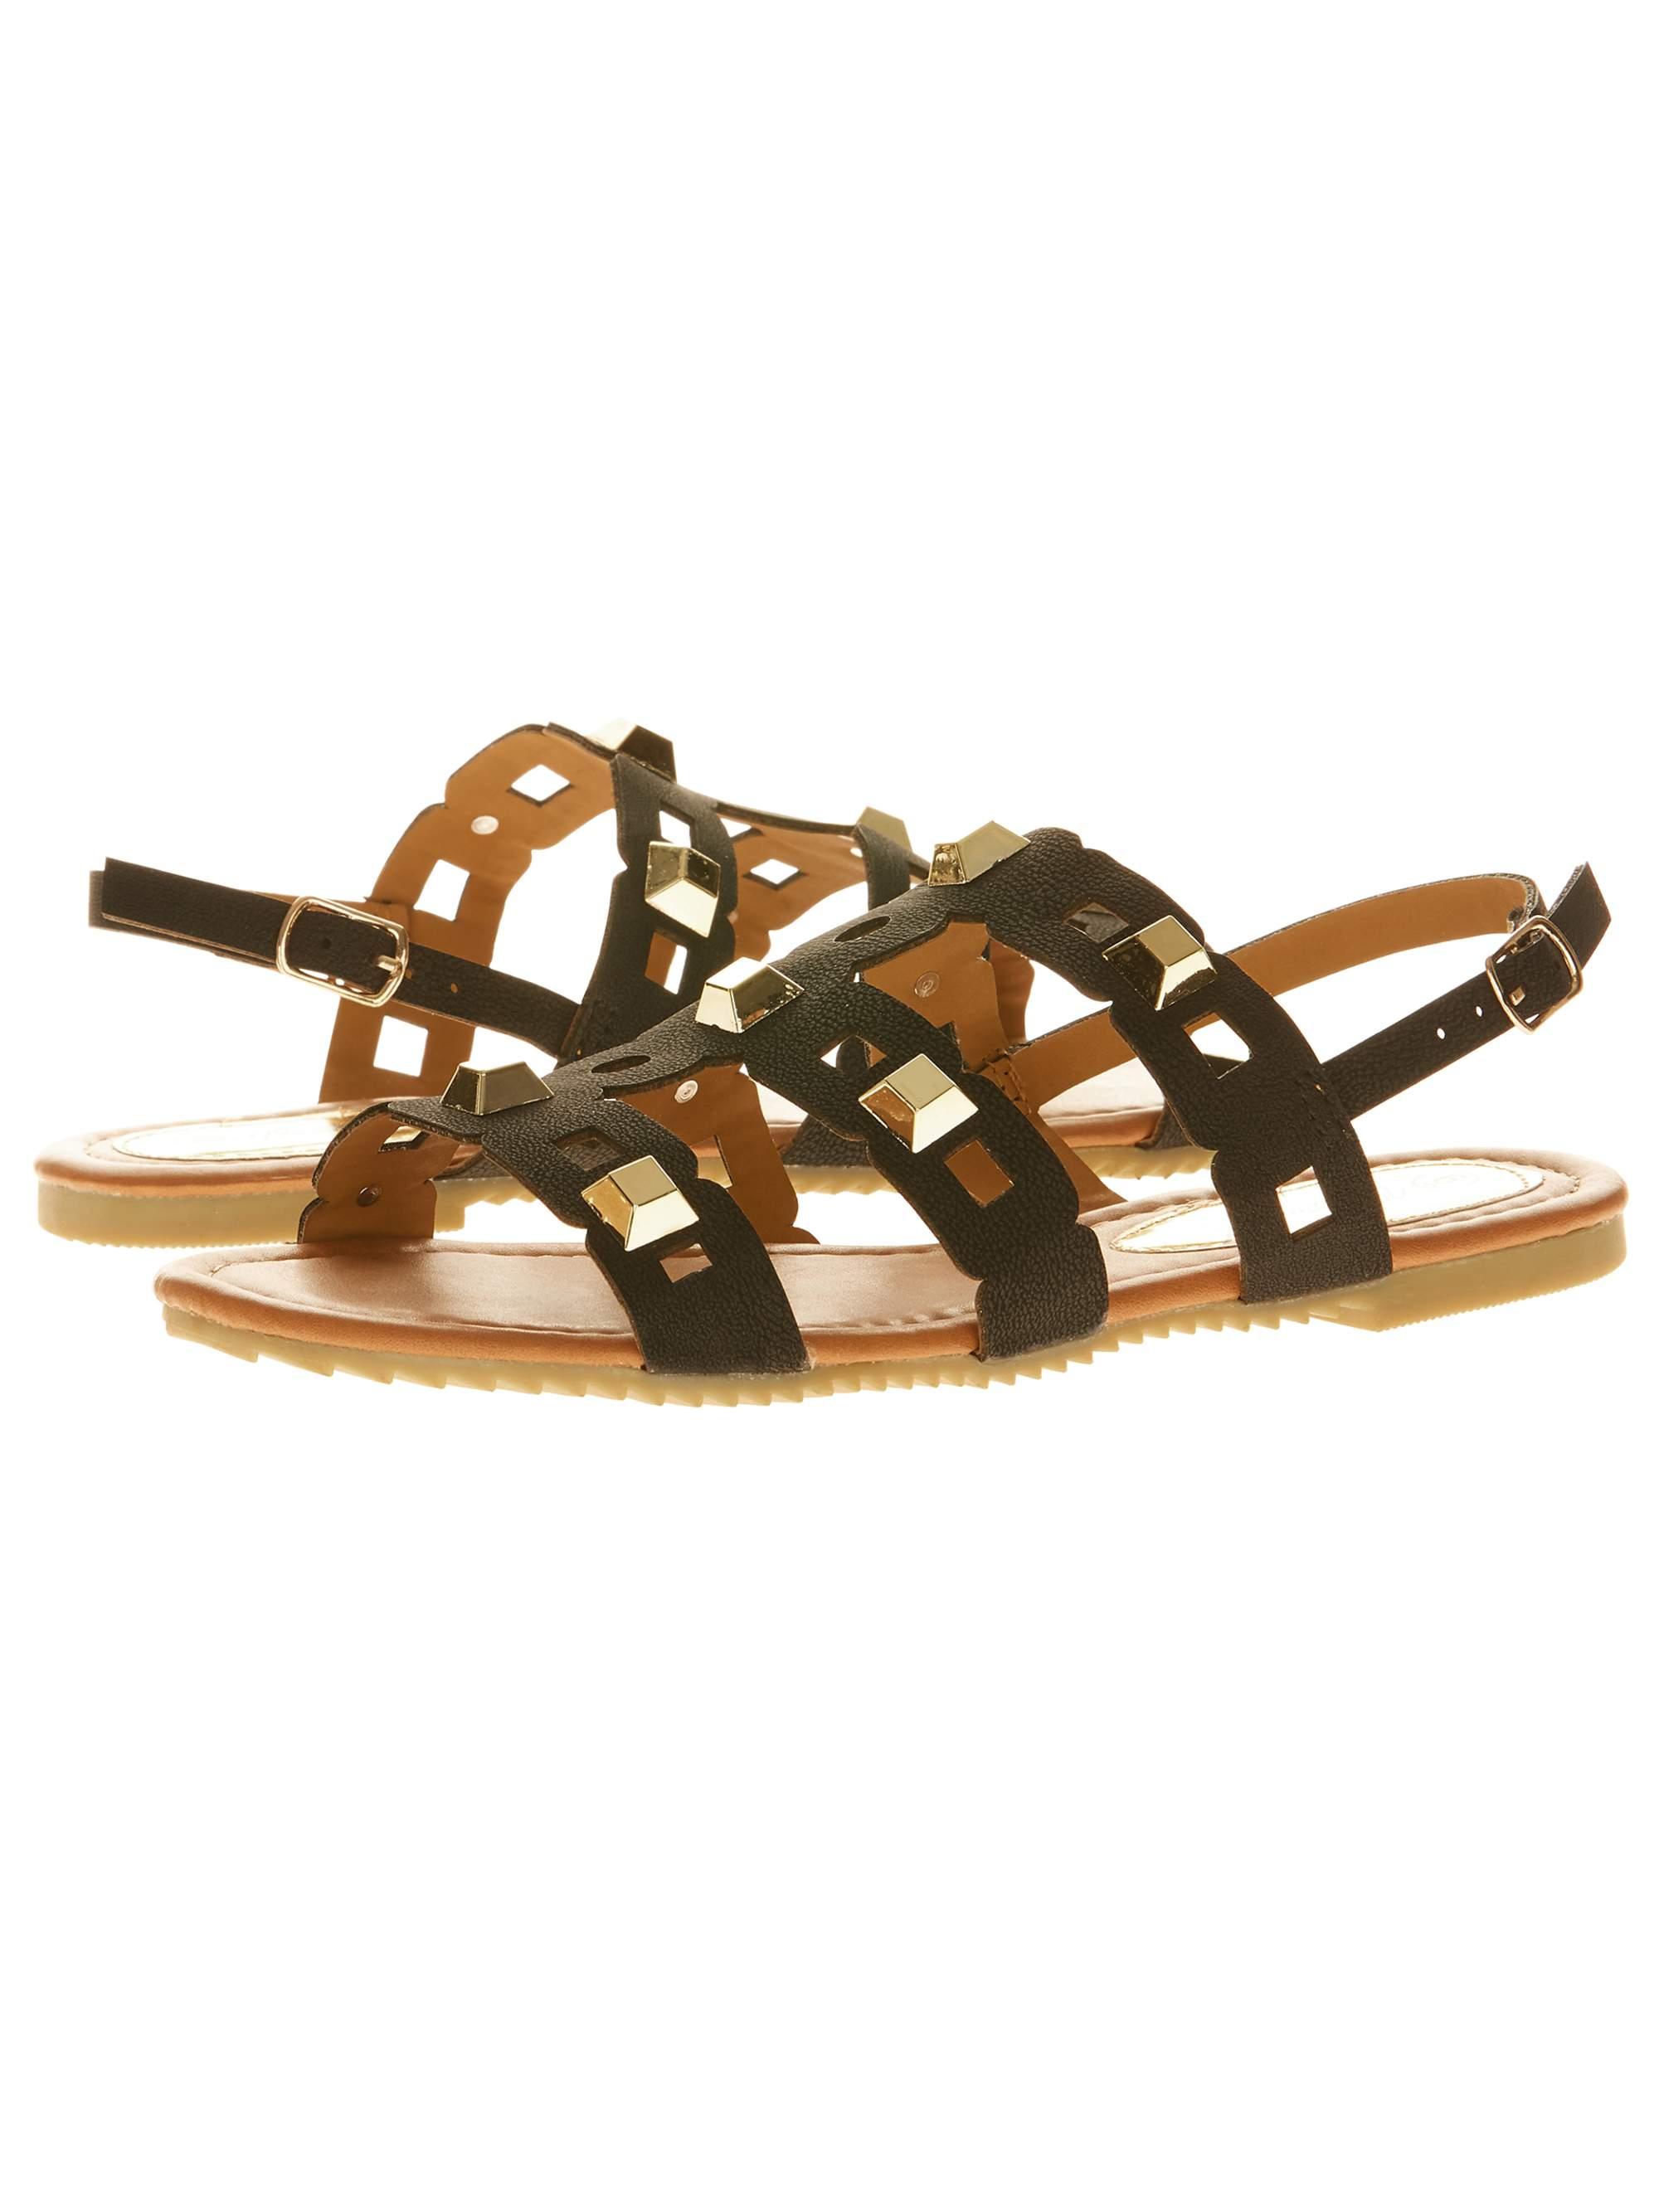 Victoria K Women's Straps and Studs Sandals